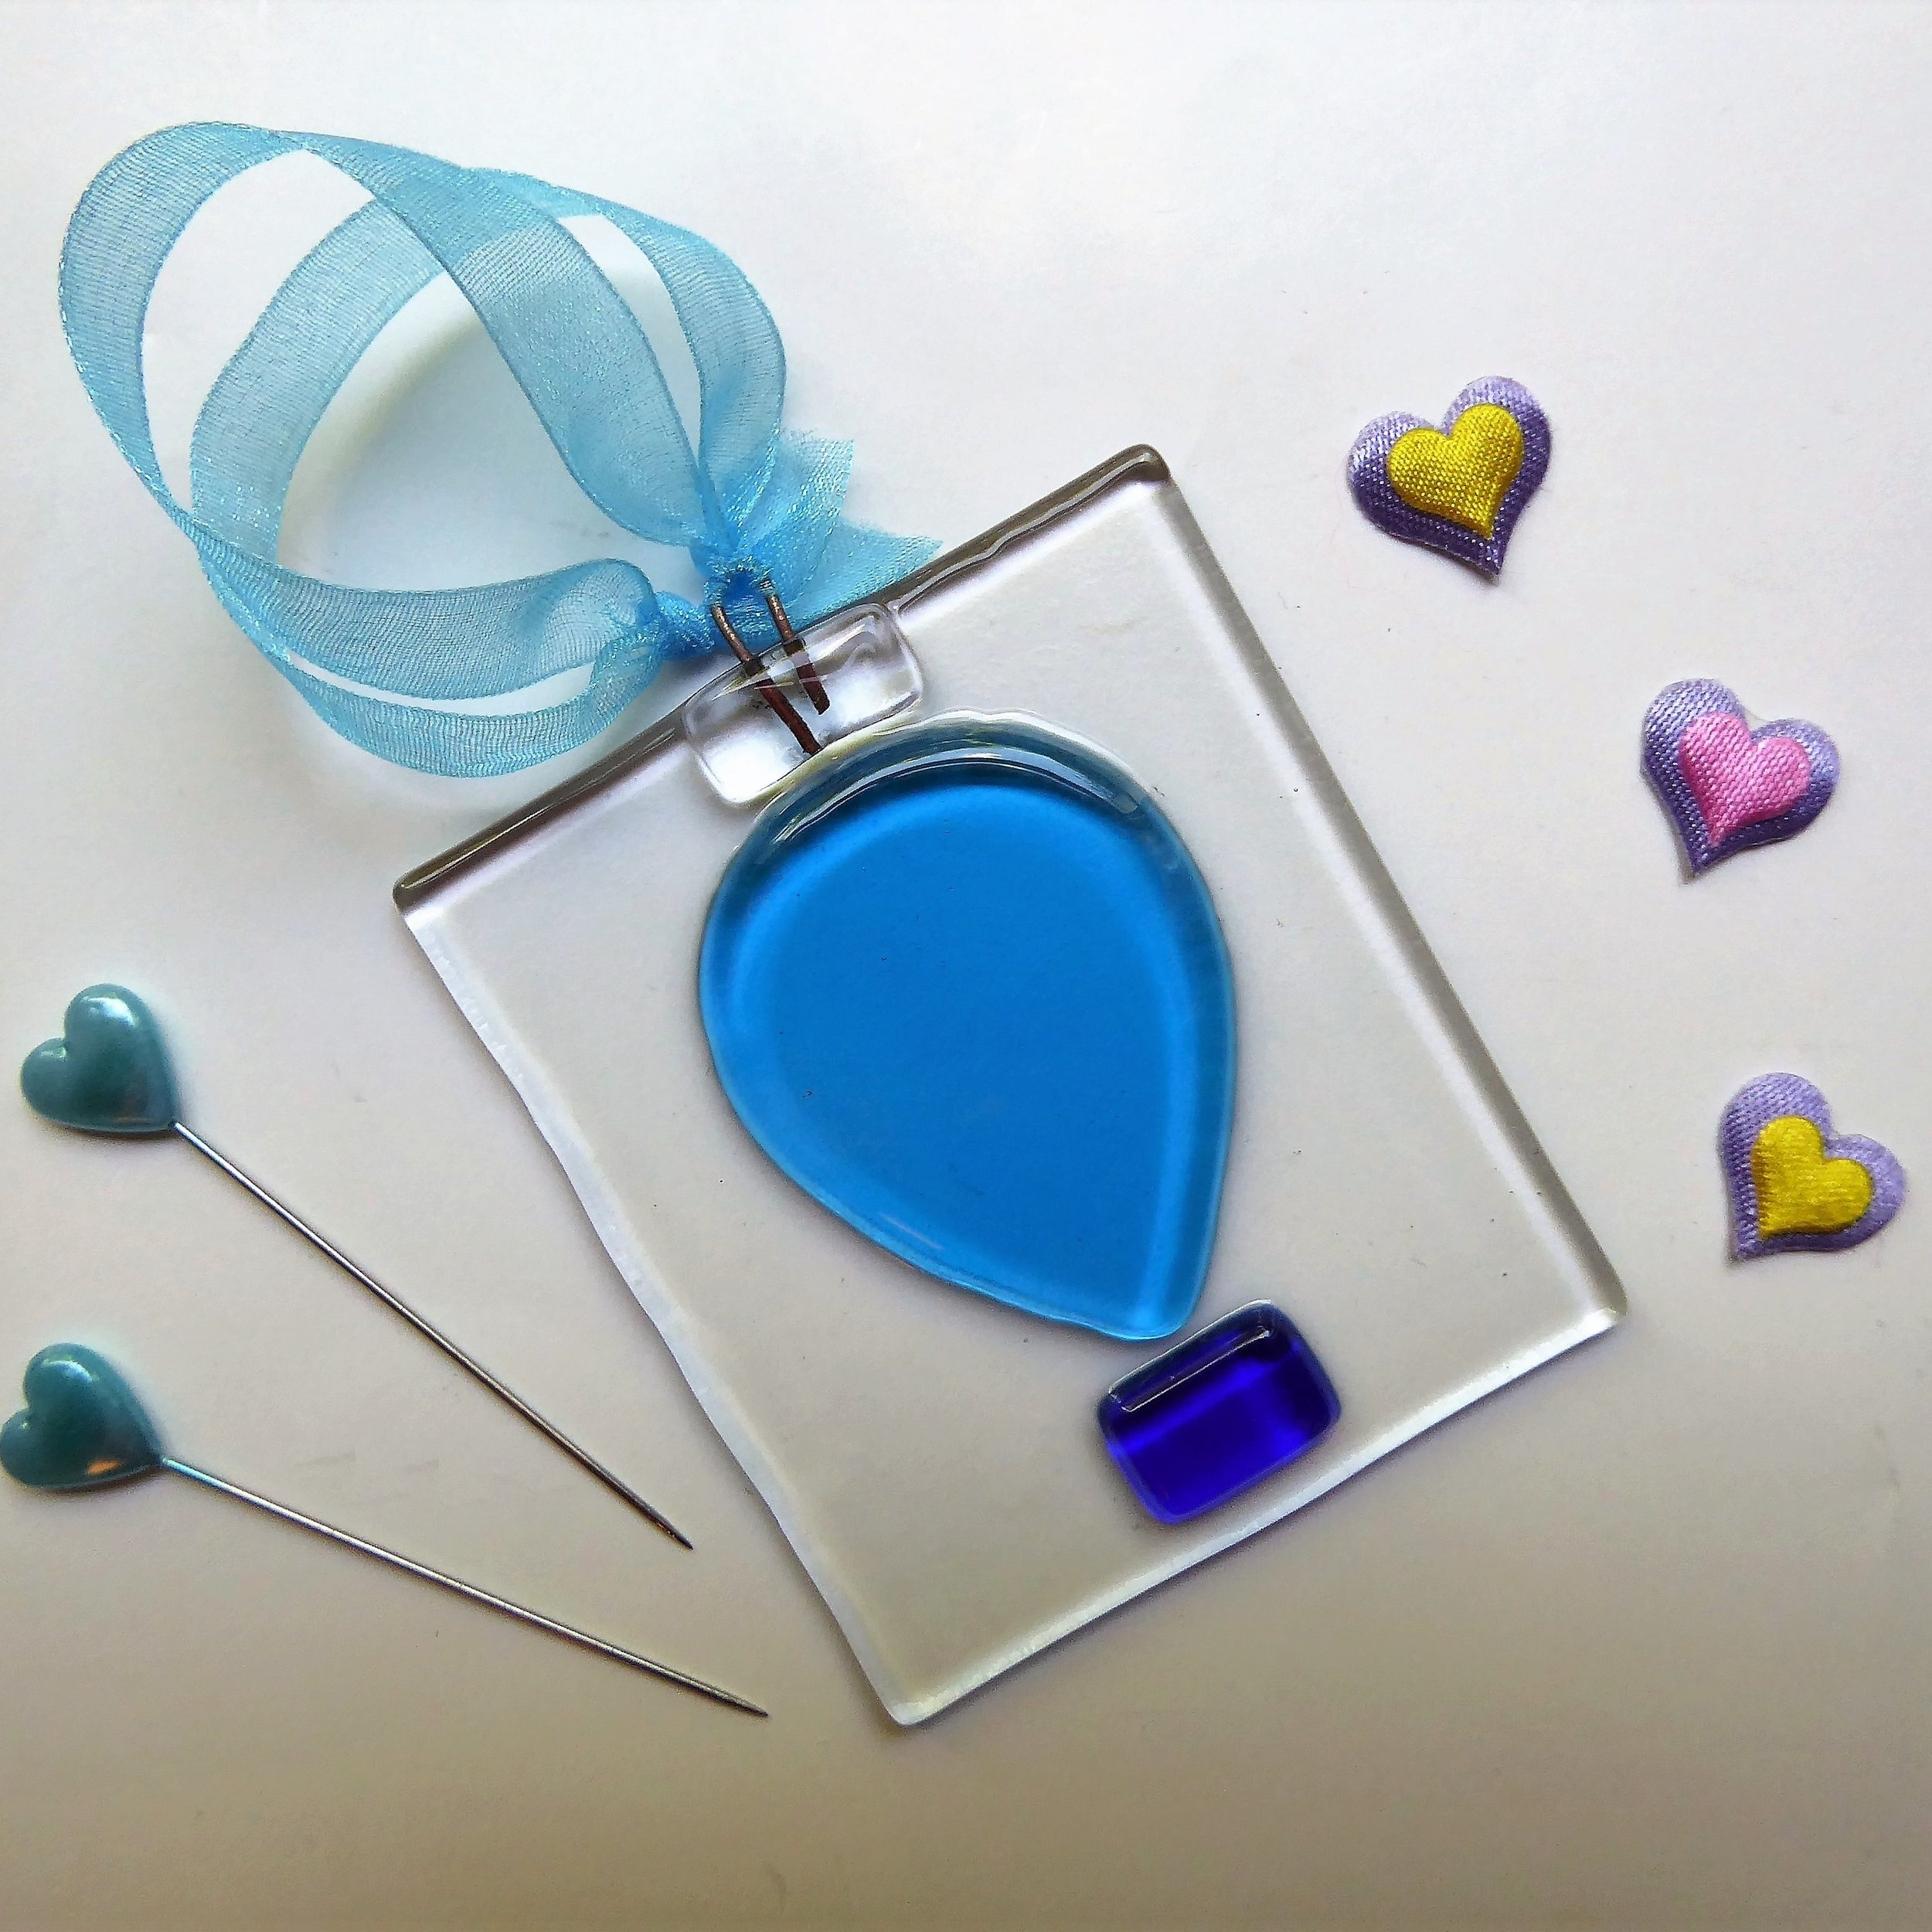 Blue balloon decoration